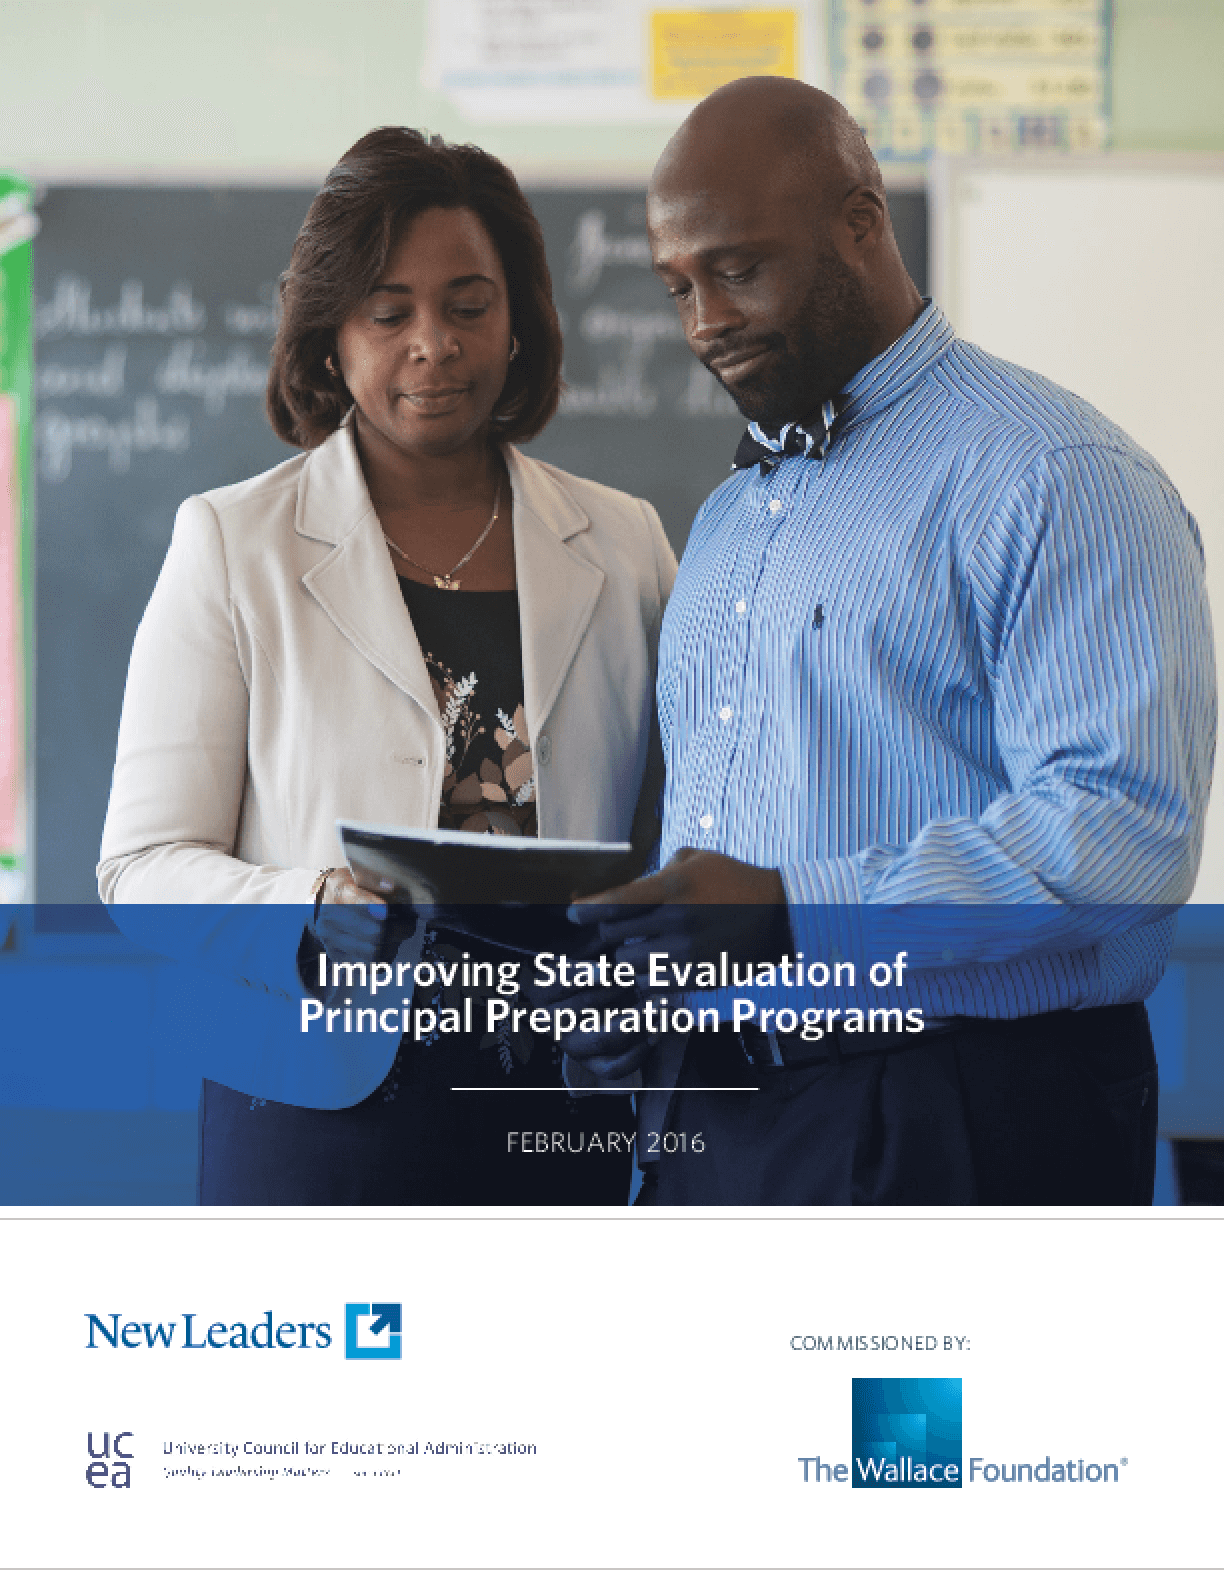 Improving State Evaluation of Principal Preparation Programs